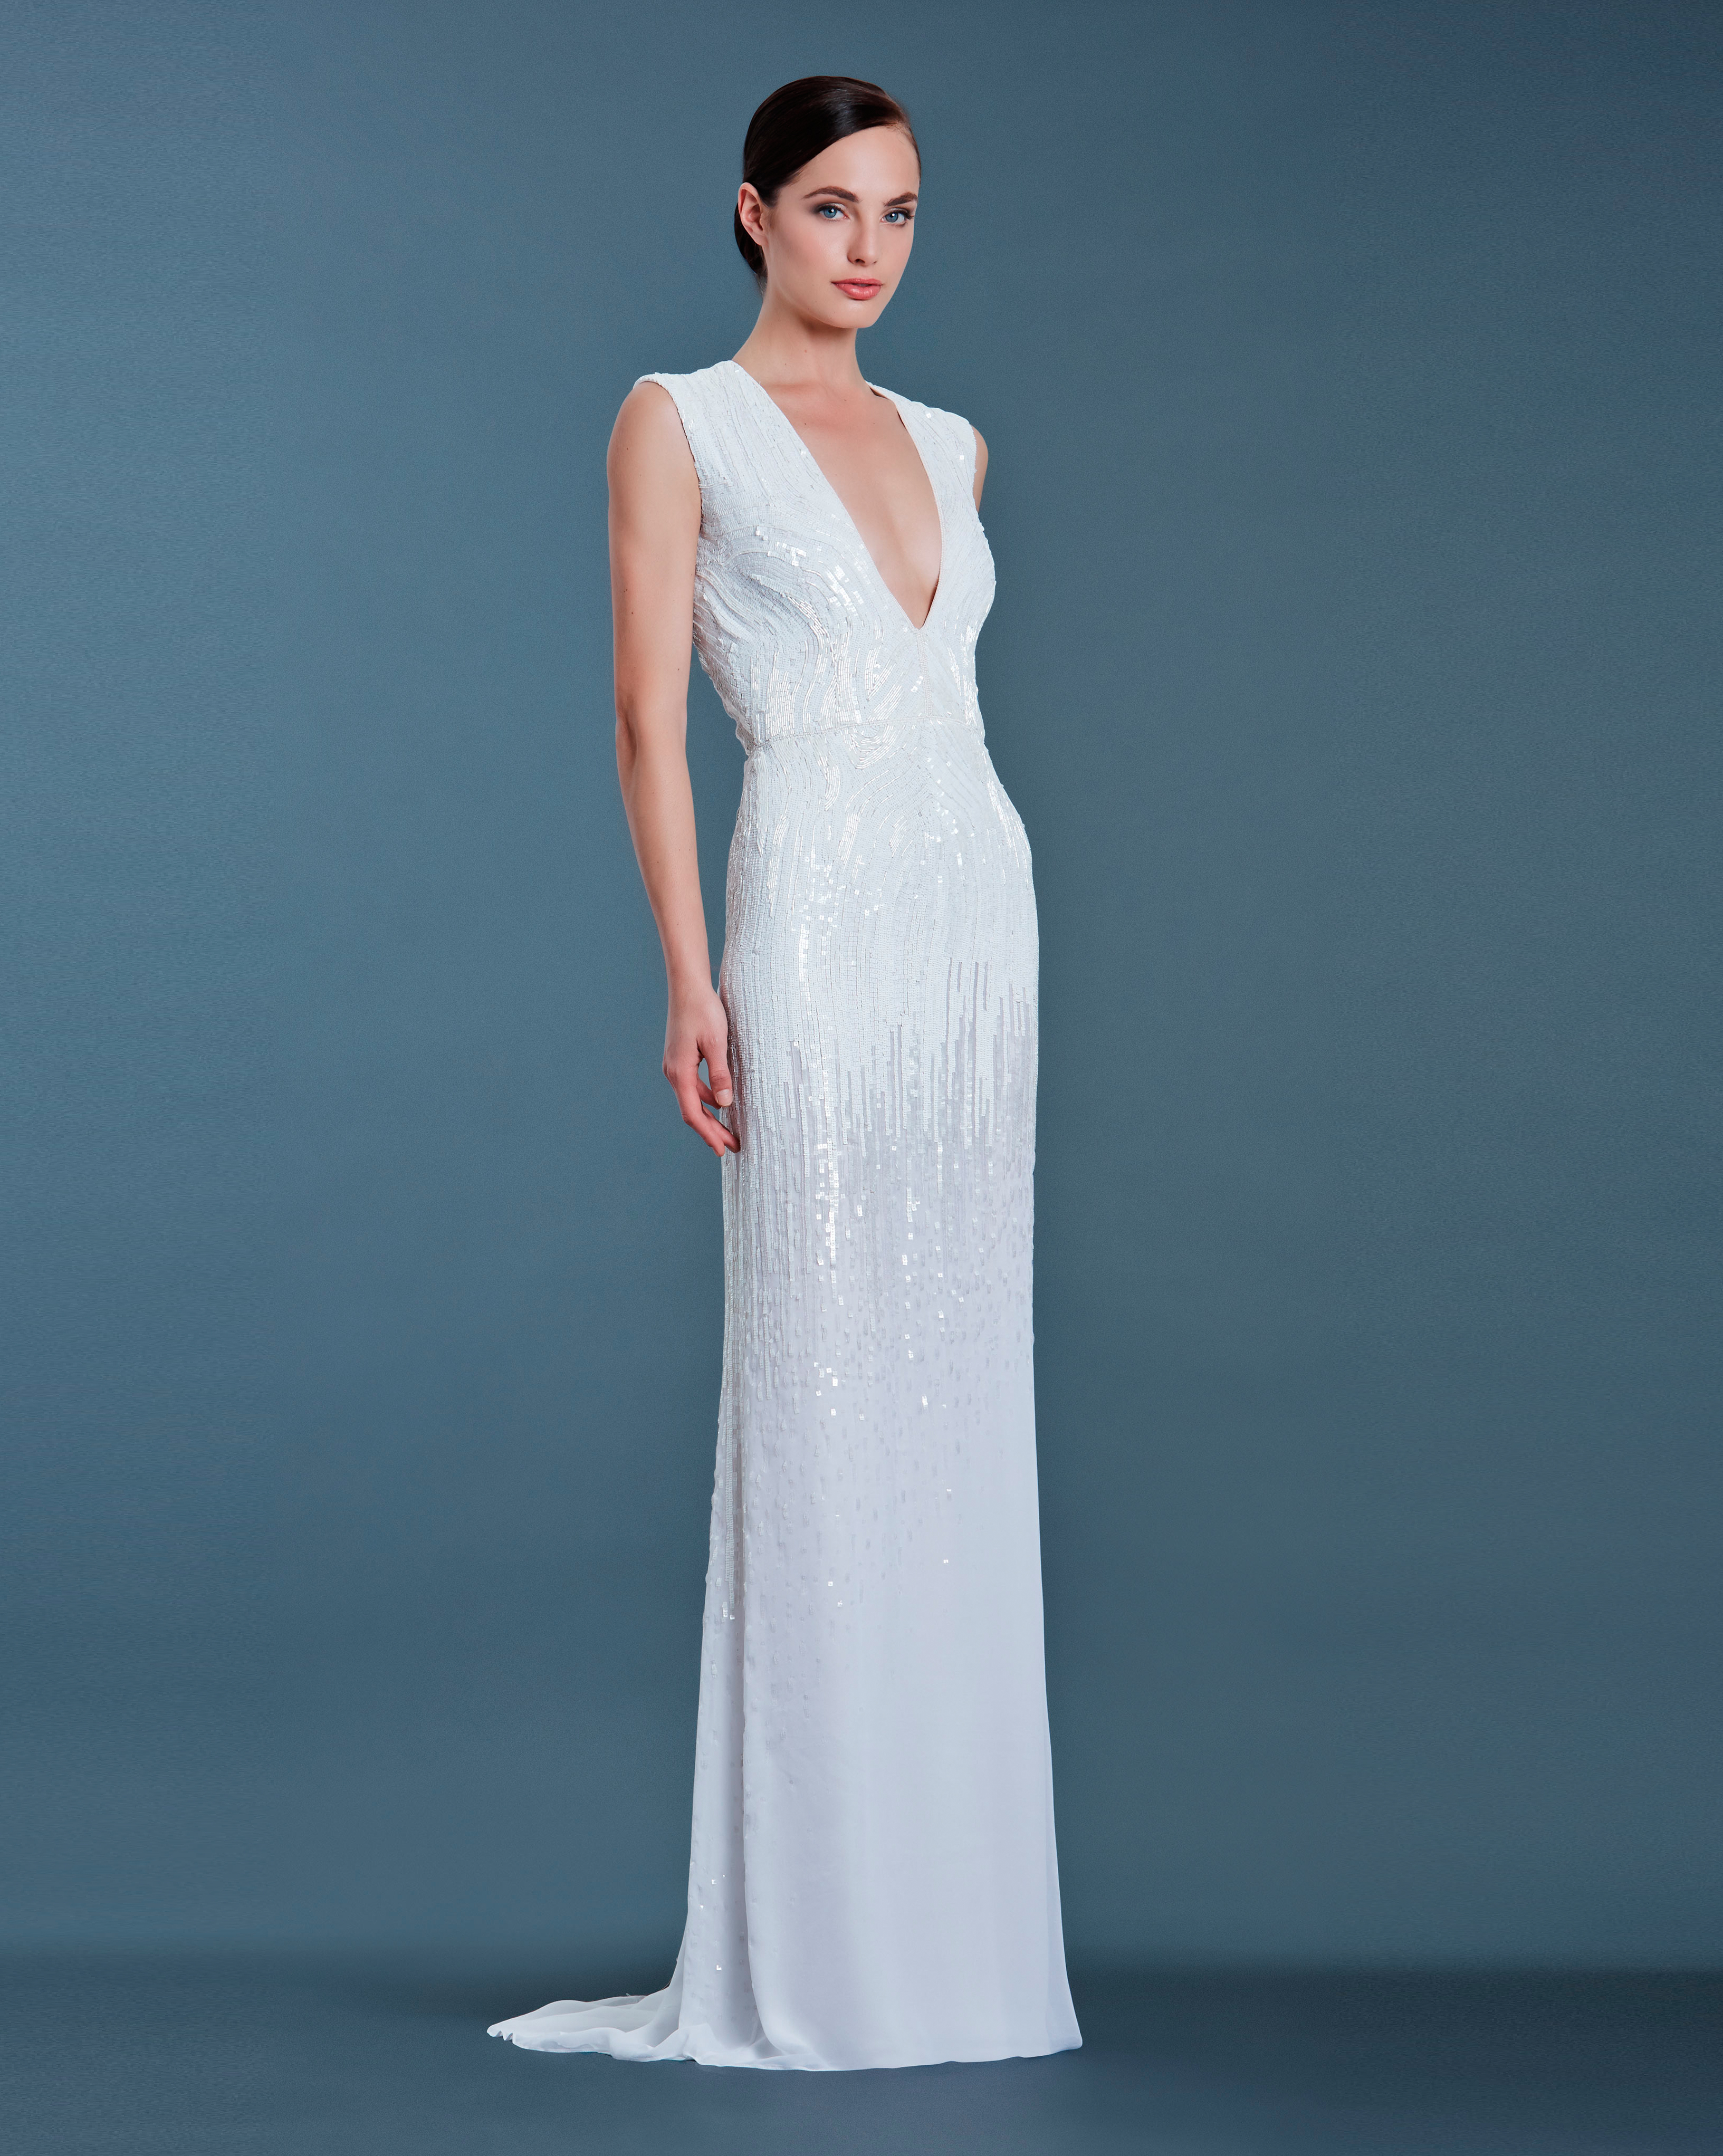 jmendel-fall2016-wedding-dress-1-celine.jpg